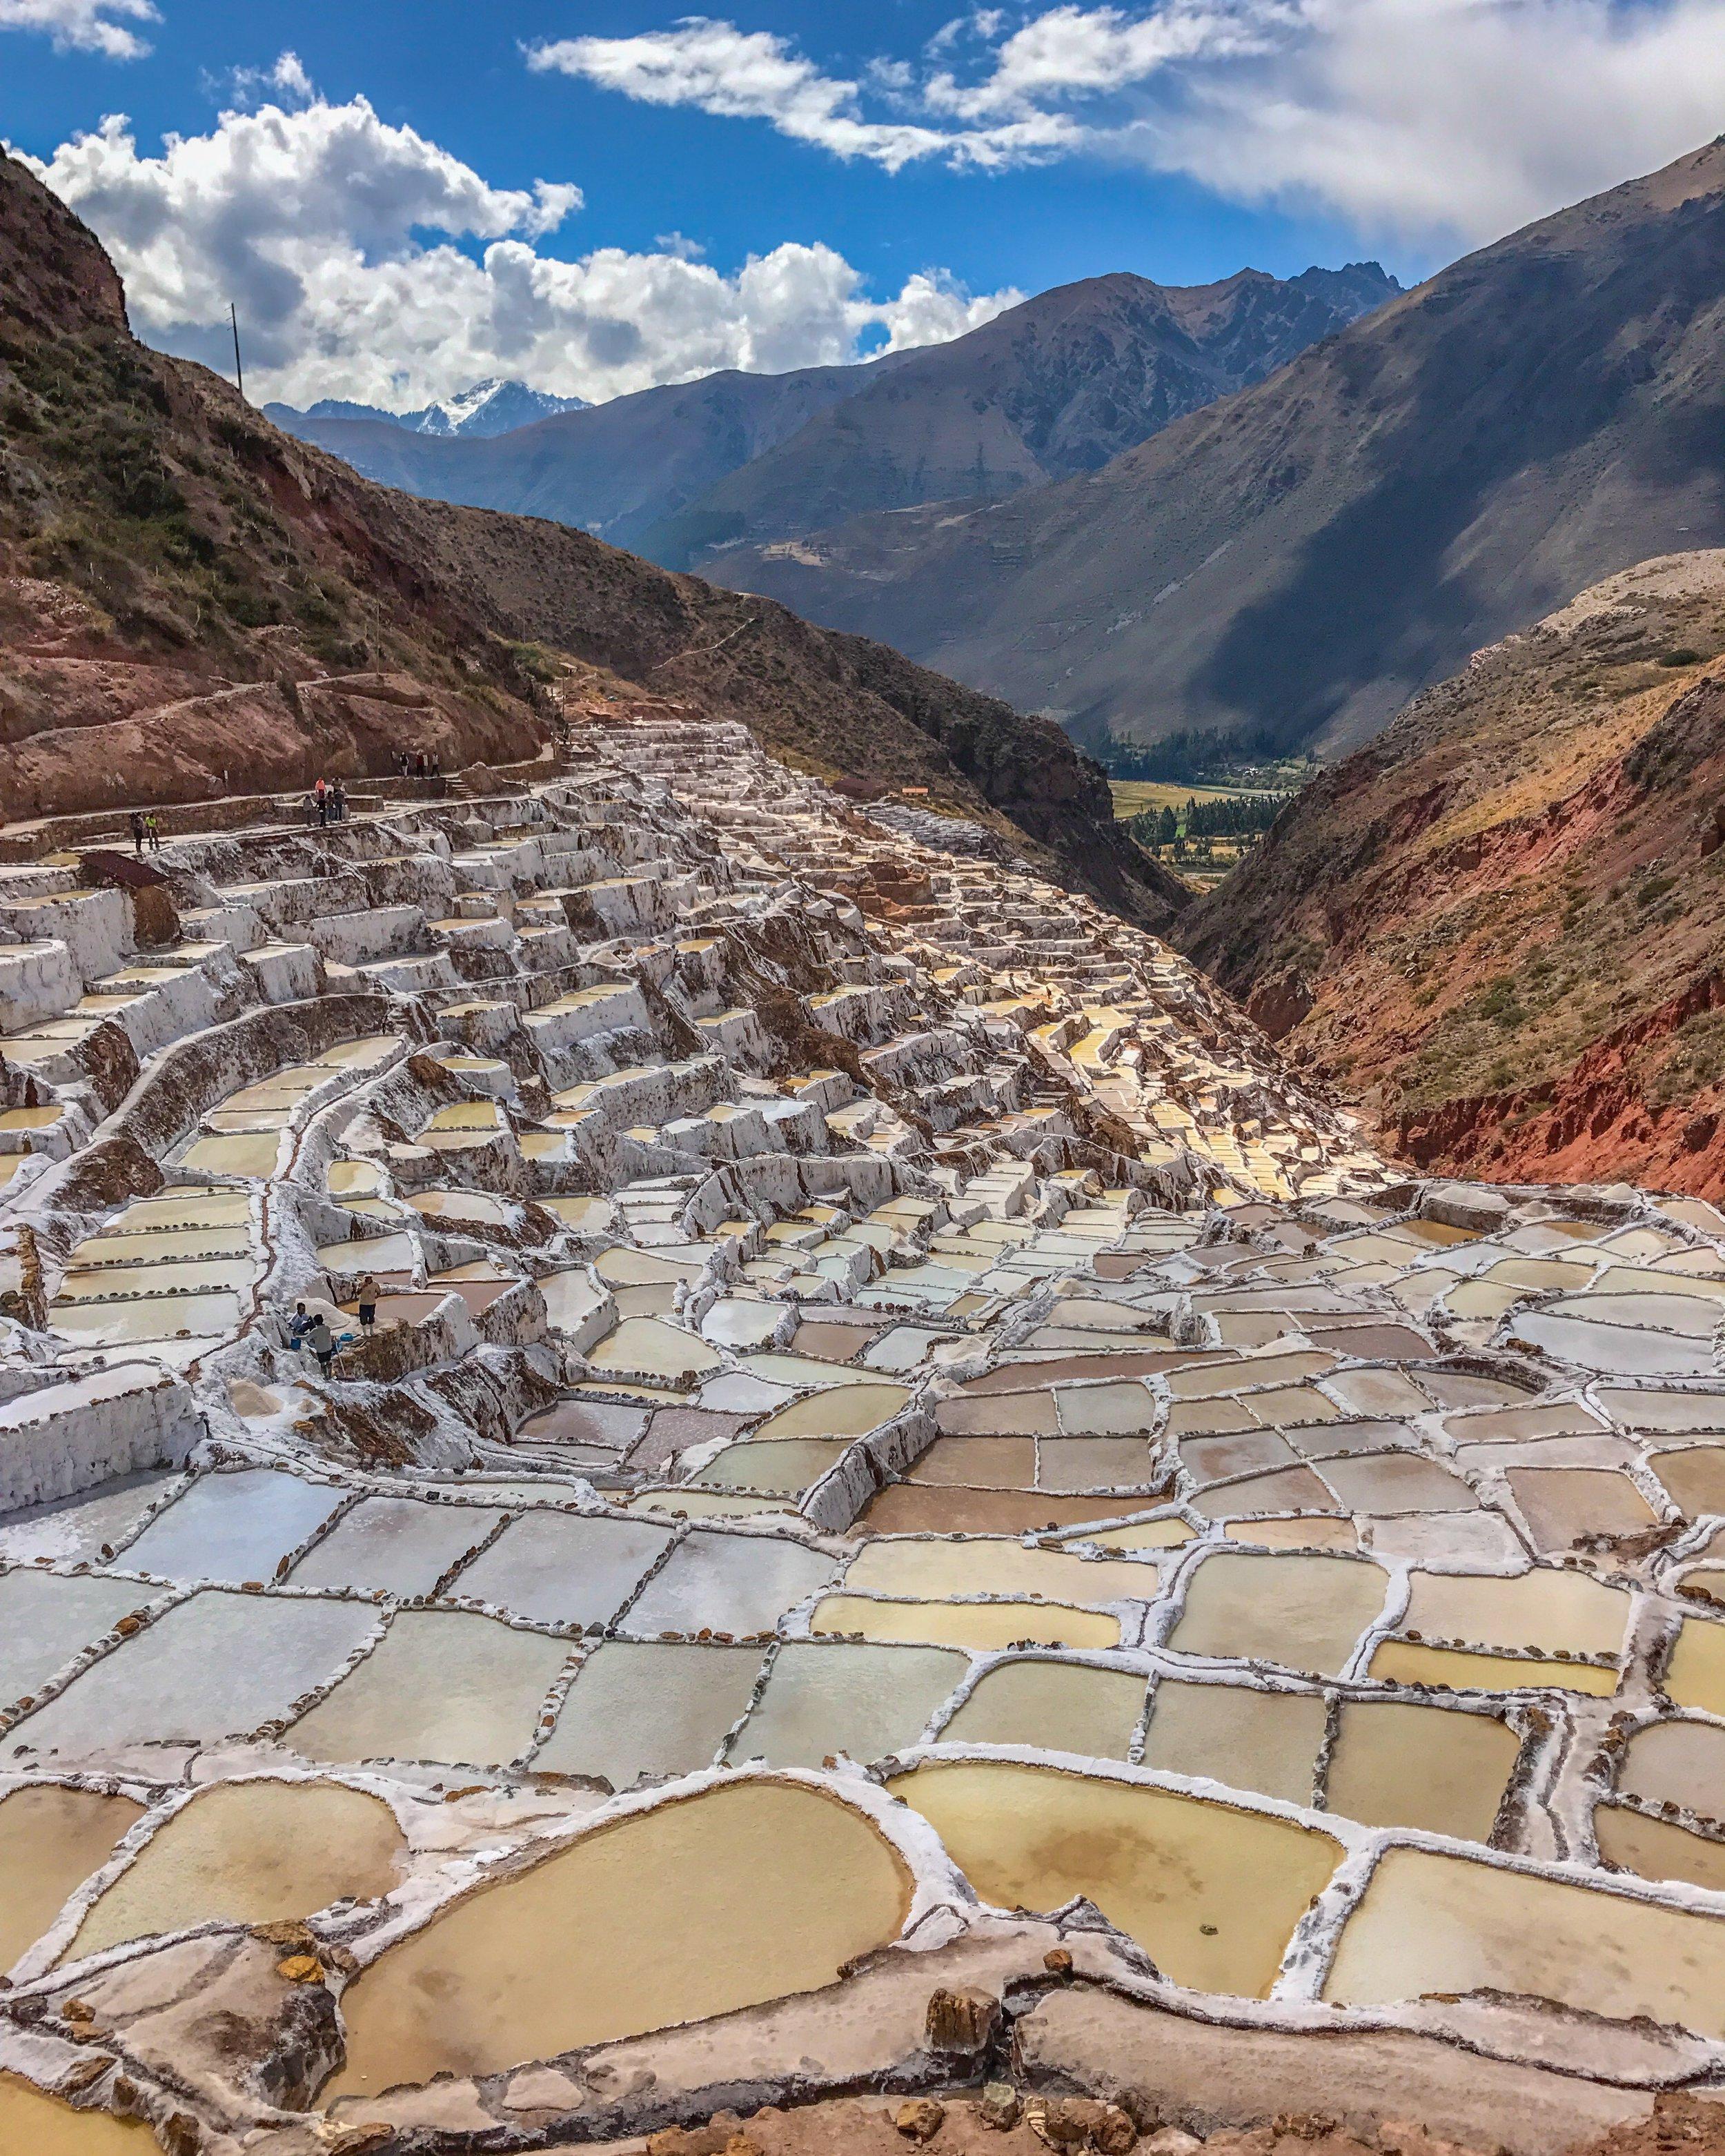 Maras salt mines near Cusco